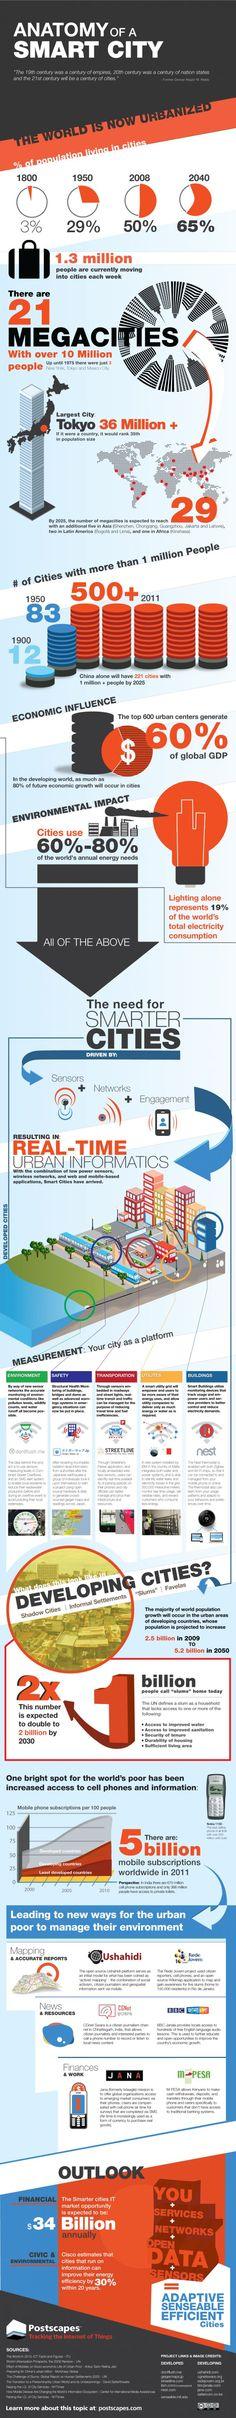 Anatomy of a Smart City / Anatomia de la Ciudad Inteligente #smartcity #infografia #infographic #ad